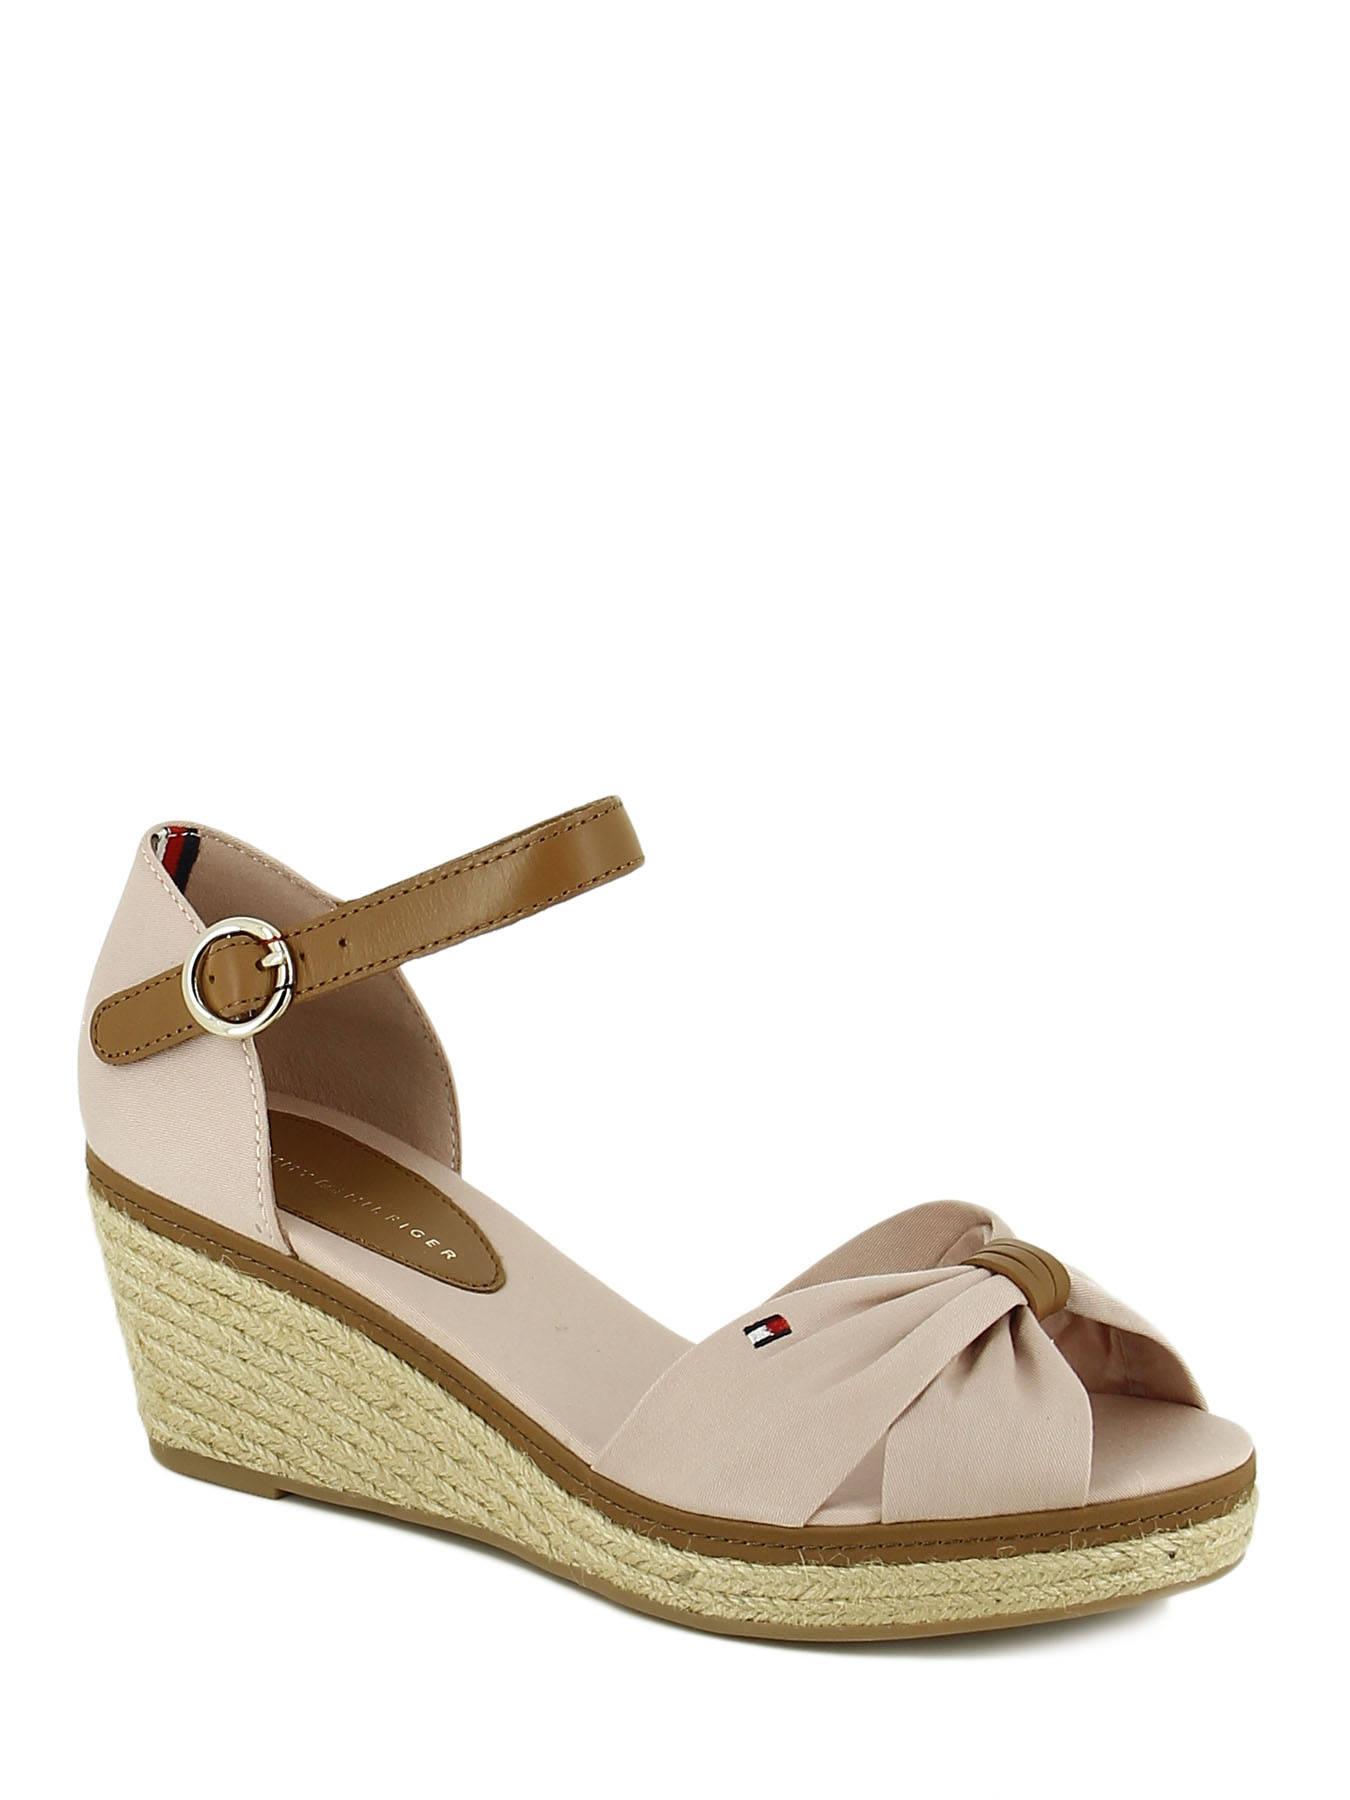 a86f0e64c65b7b ... Sandals Wedge Heel Tommy hilfiger Pink sandales   nu-pieds ELBA40D ...